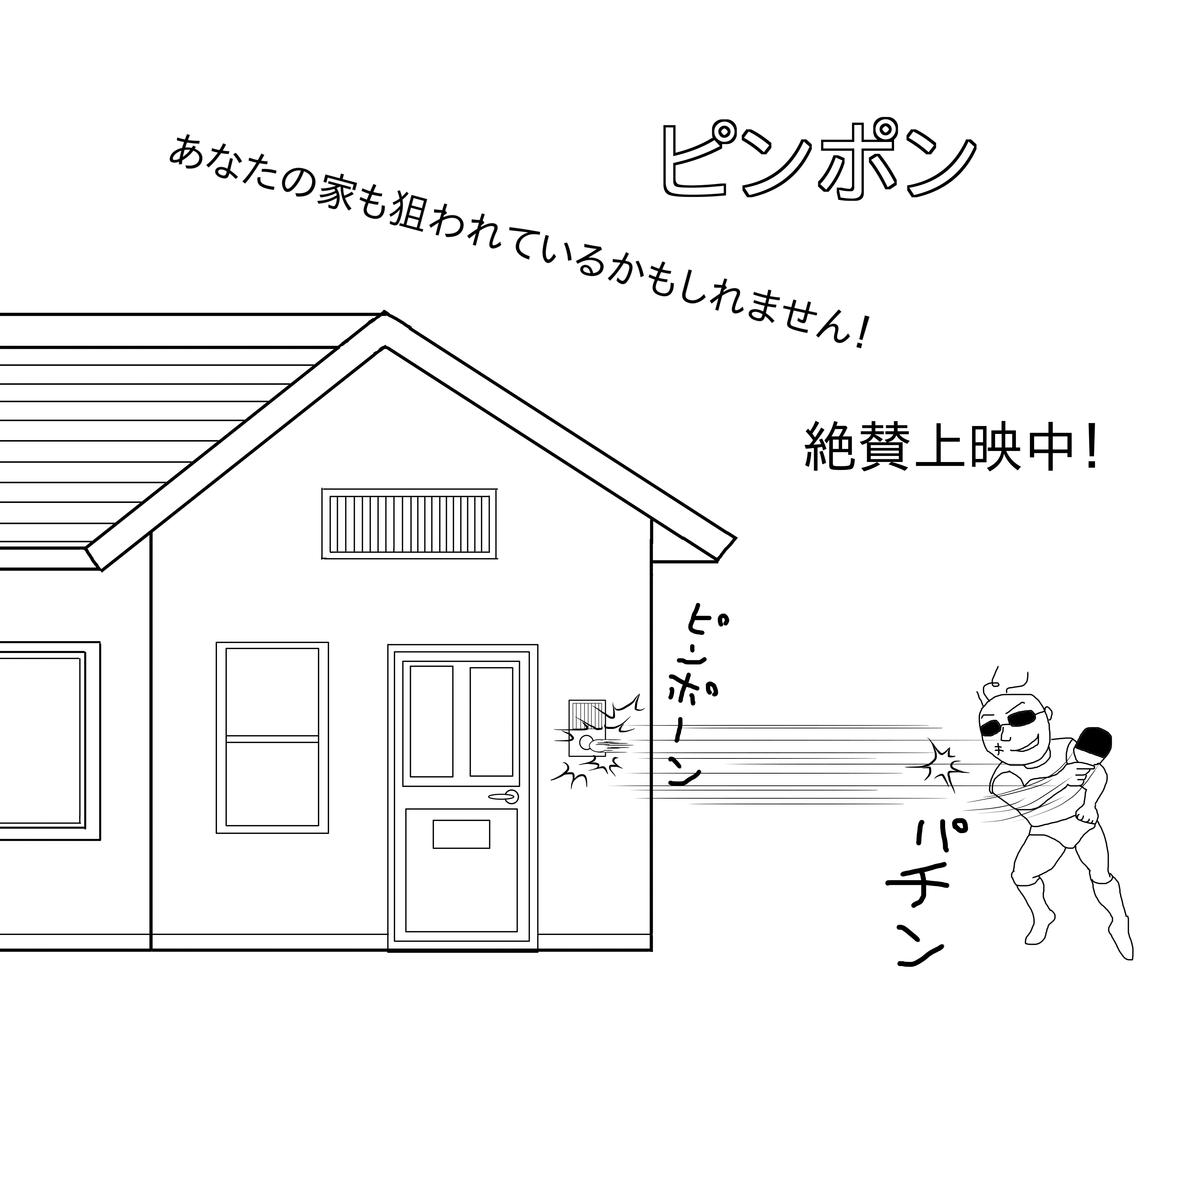 f:id:yaki295han:20200407145857p:plain